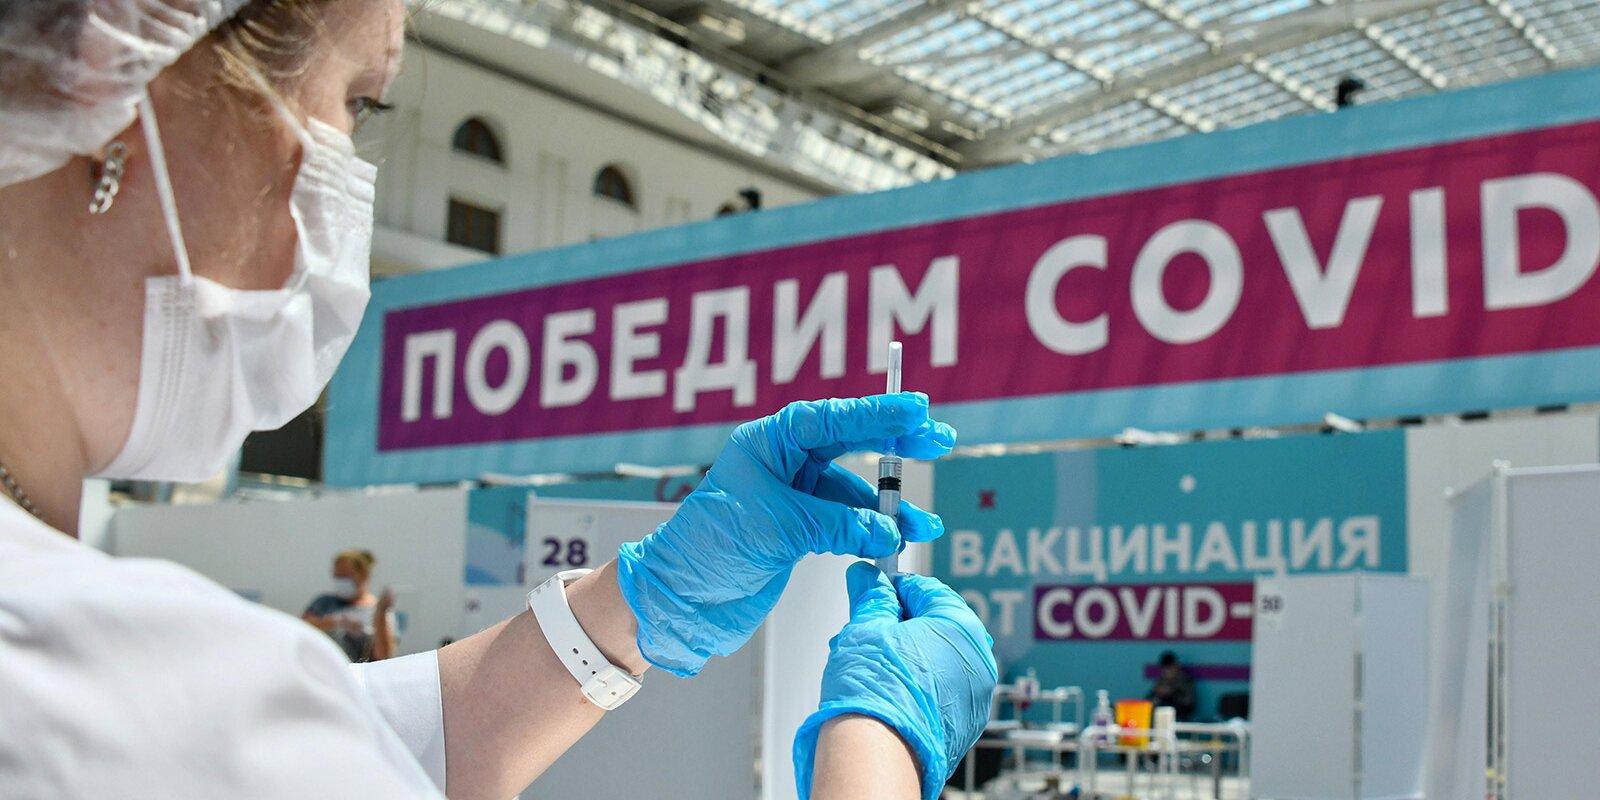 От температуры до паники: Врач рассказала о реакции организма на страх перед прививкой от ковида